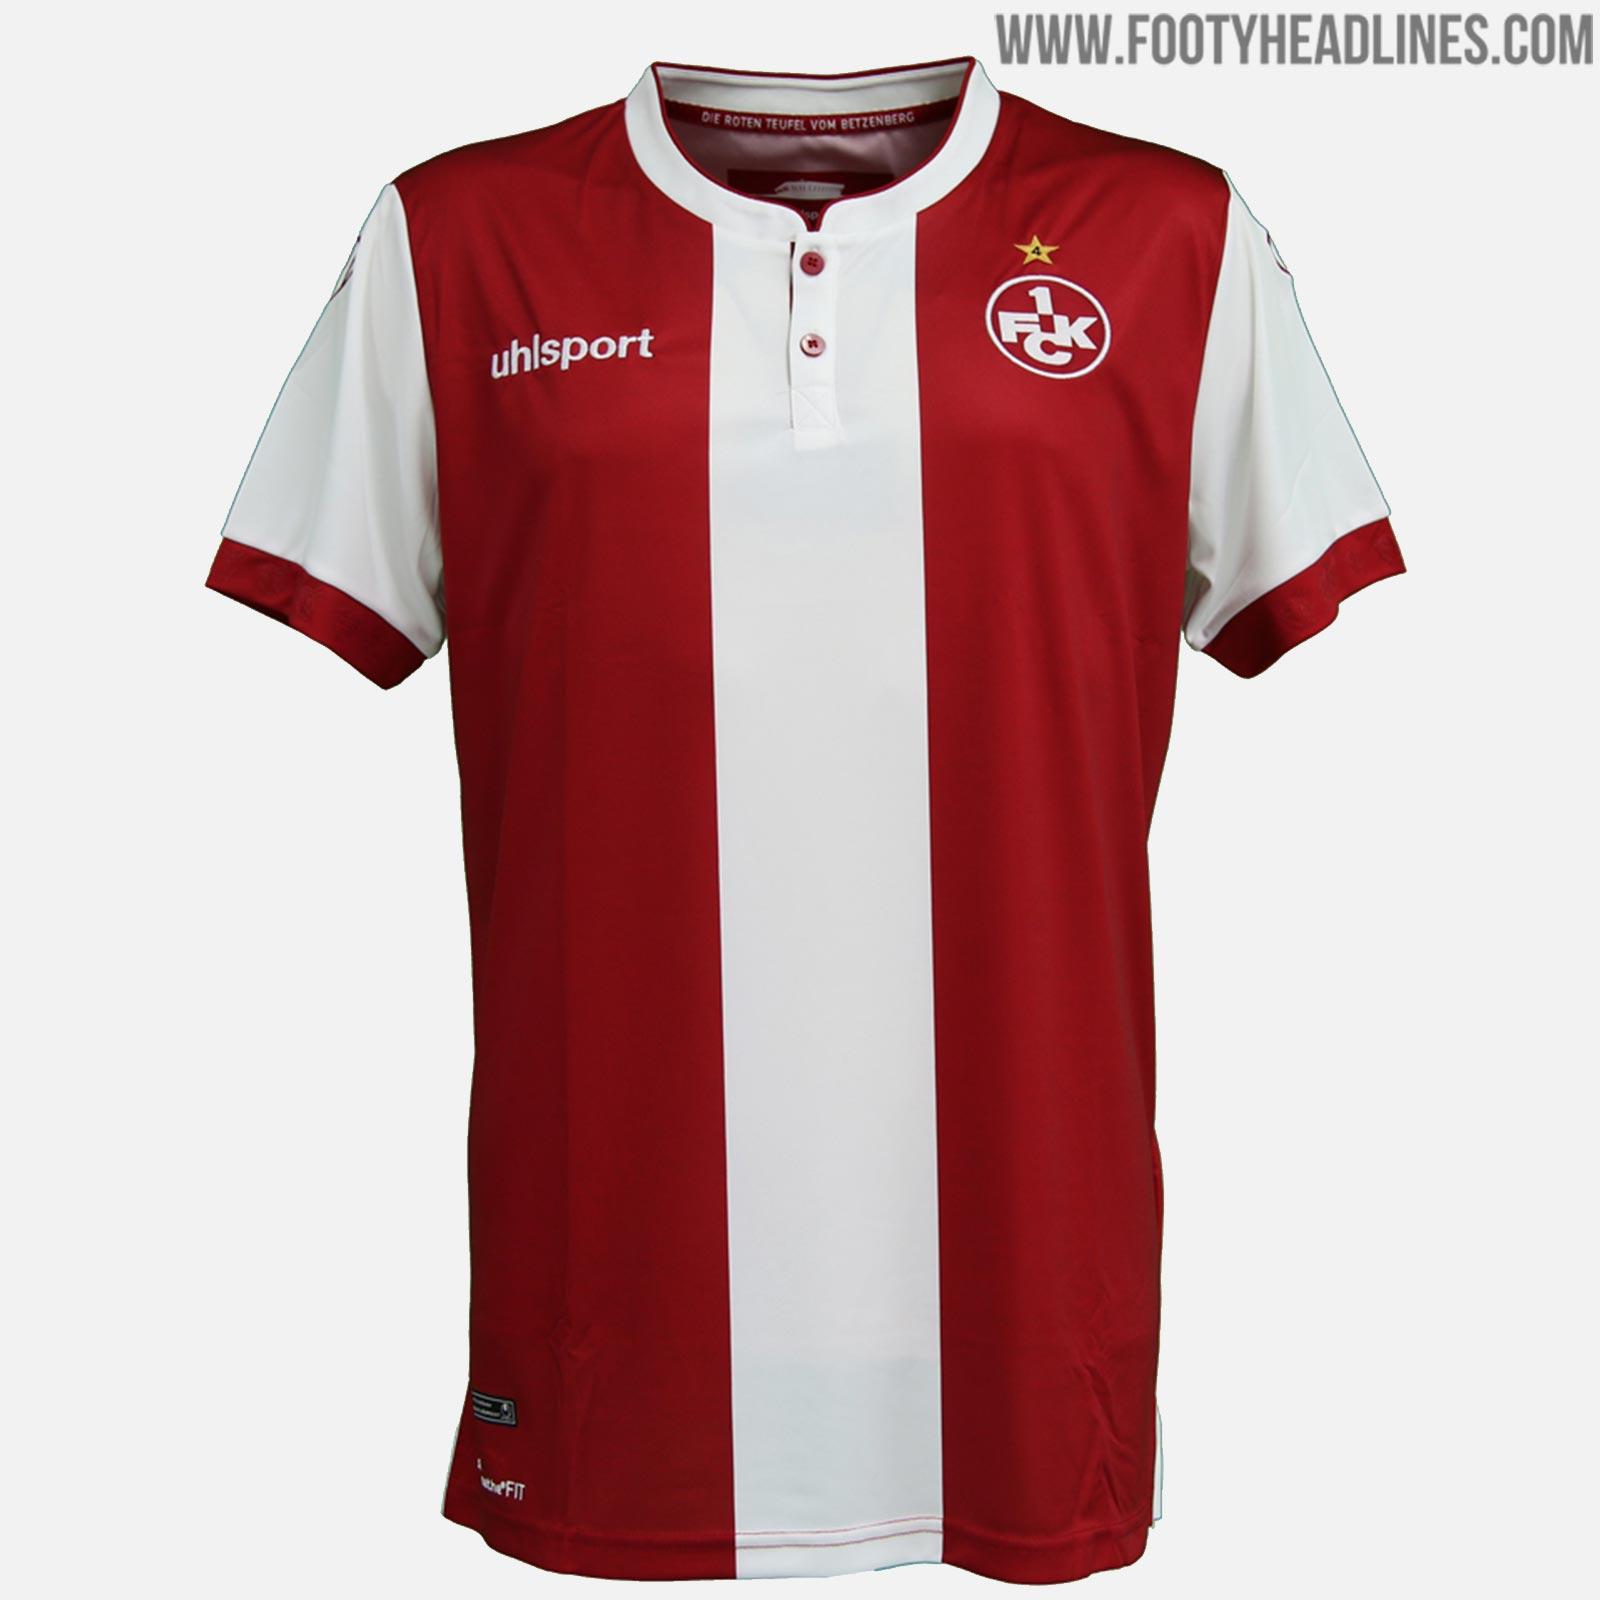 47e76053428 1. FC Kaiserslautern 18-19 Home   Away Kits Released